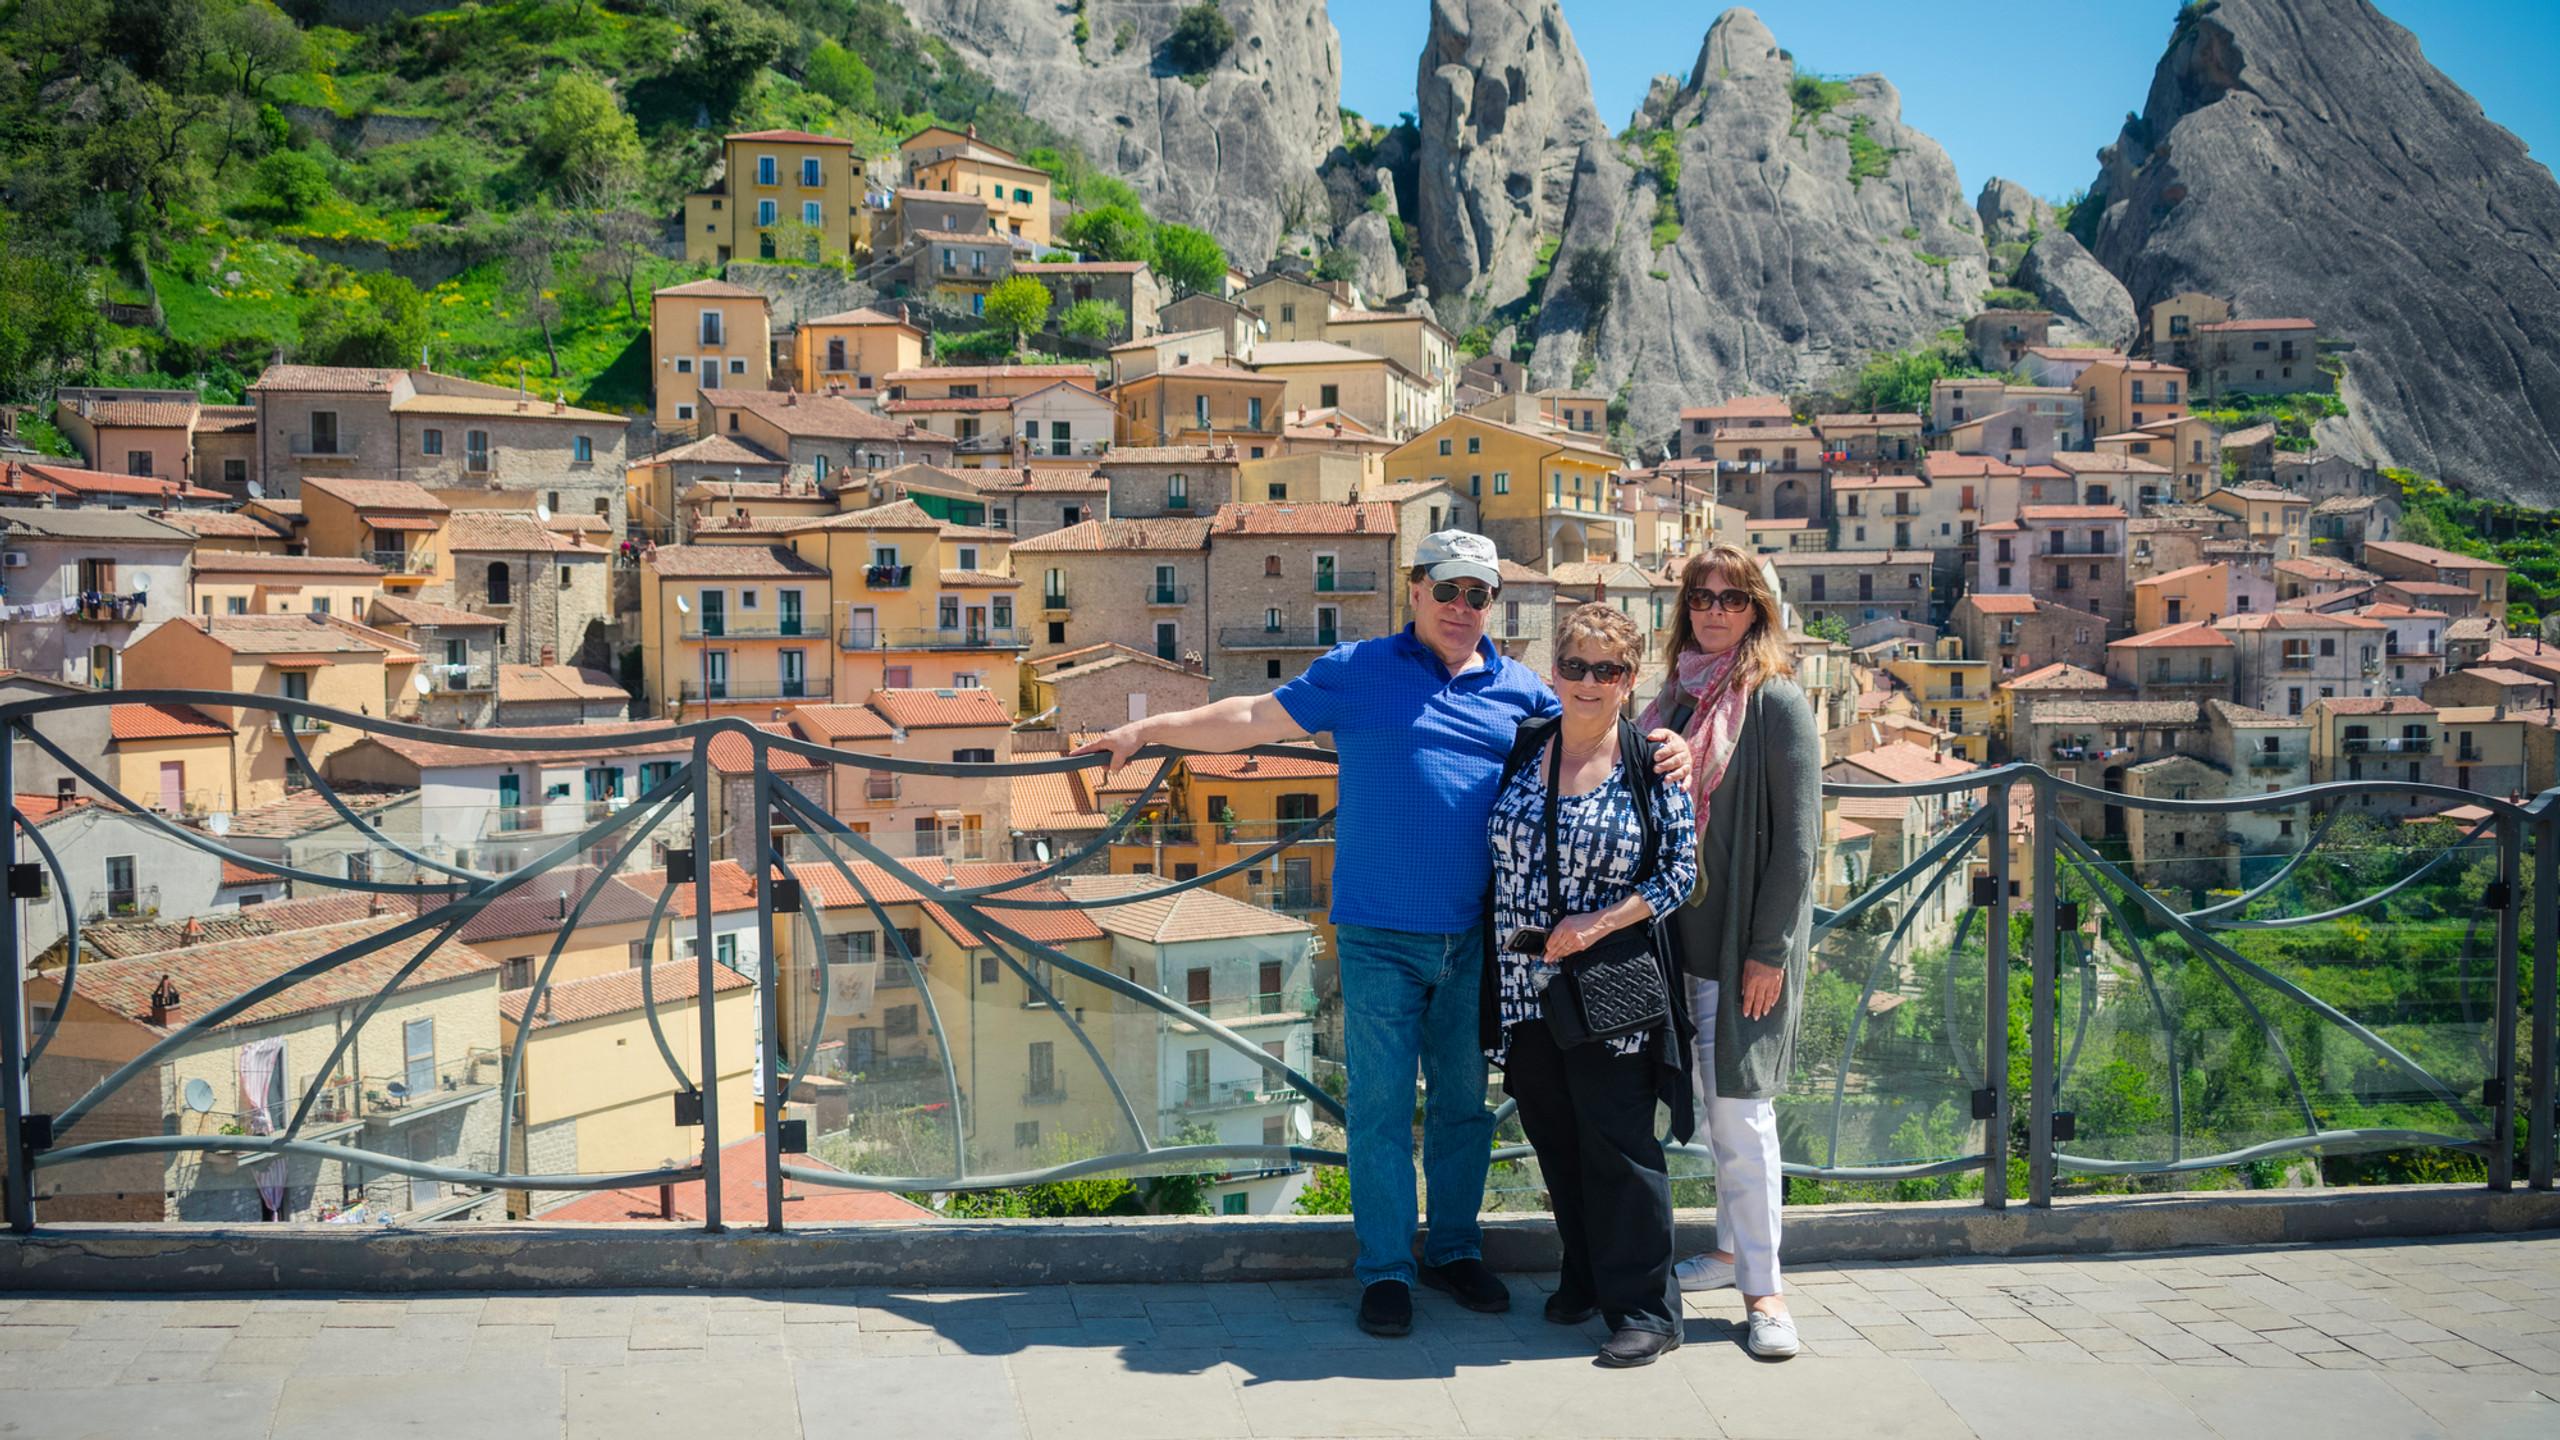 Tours of Basilicata